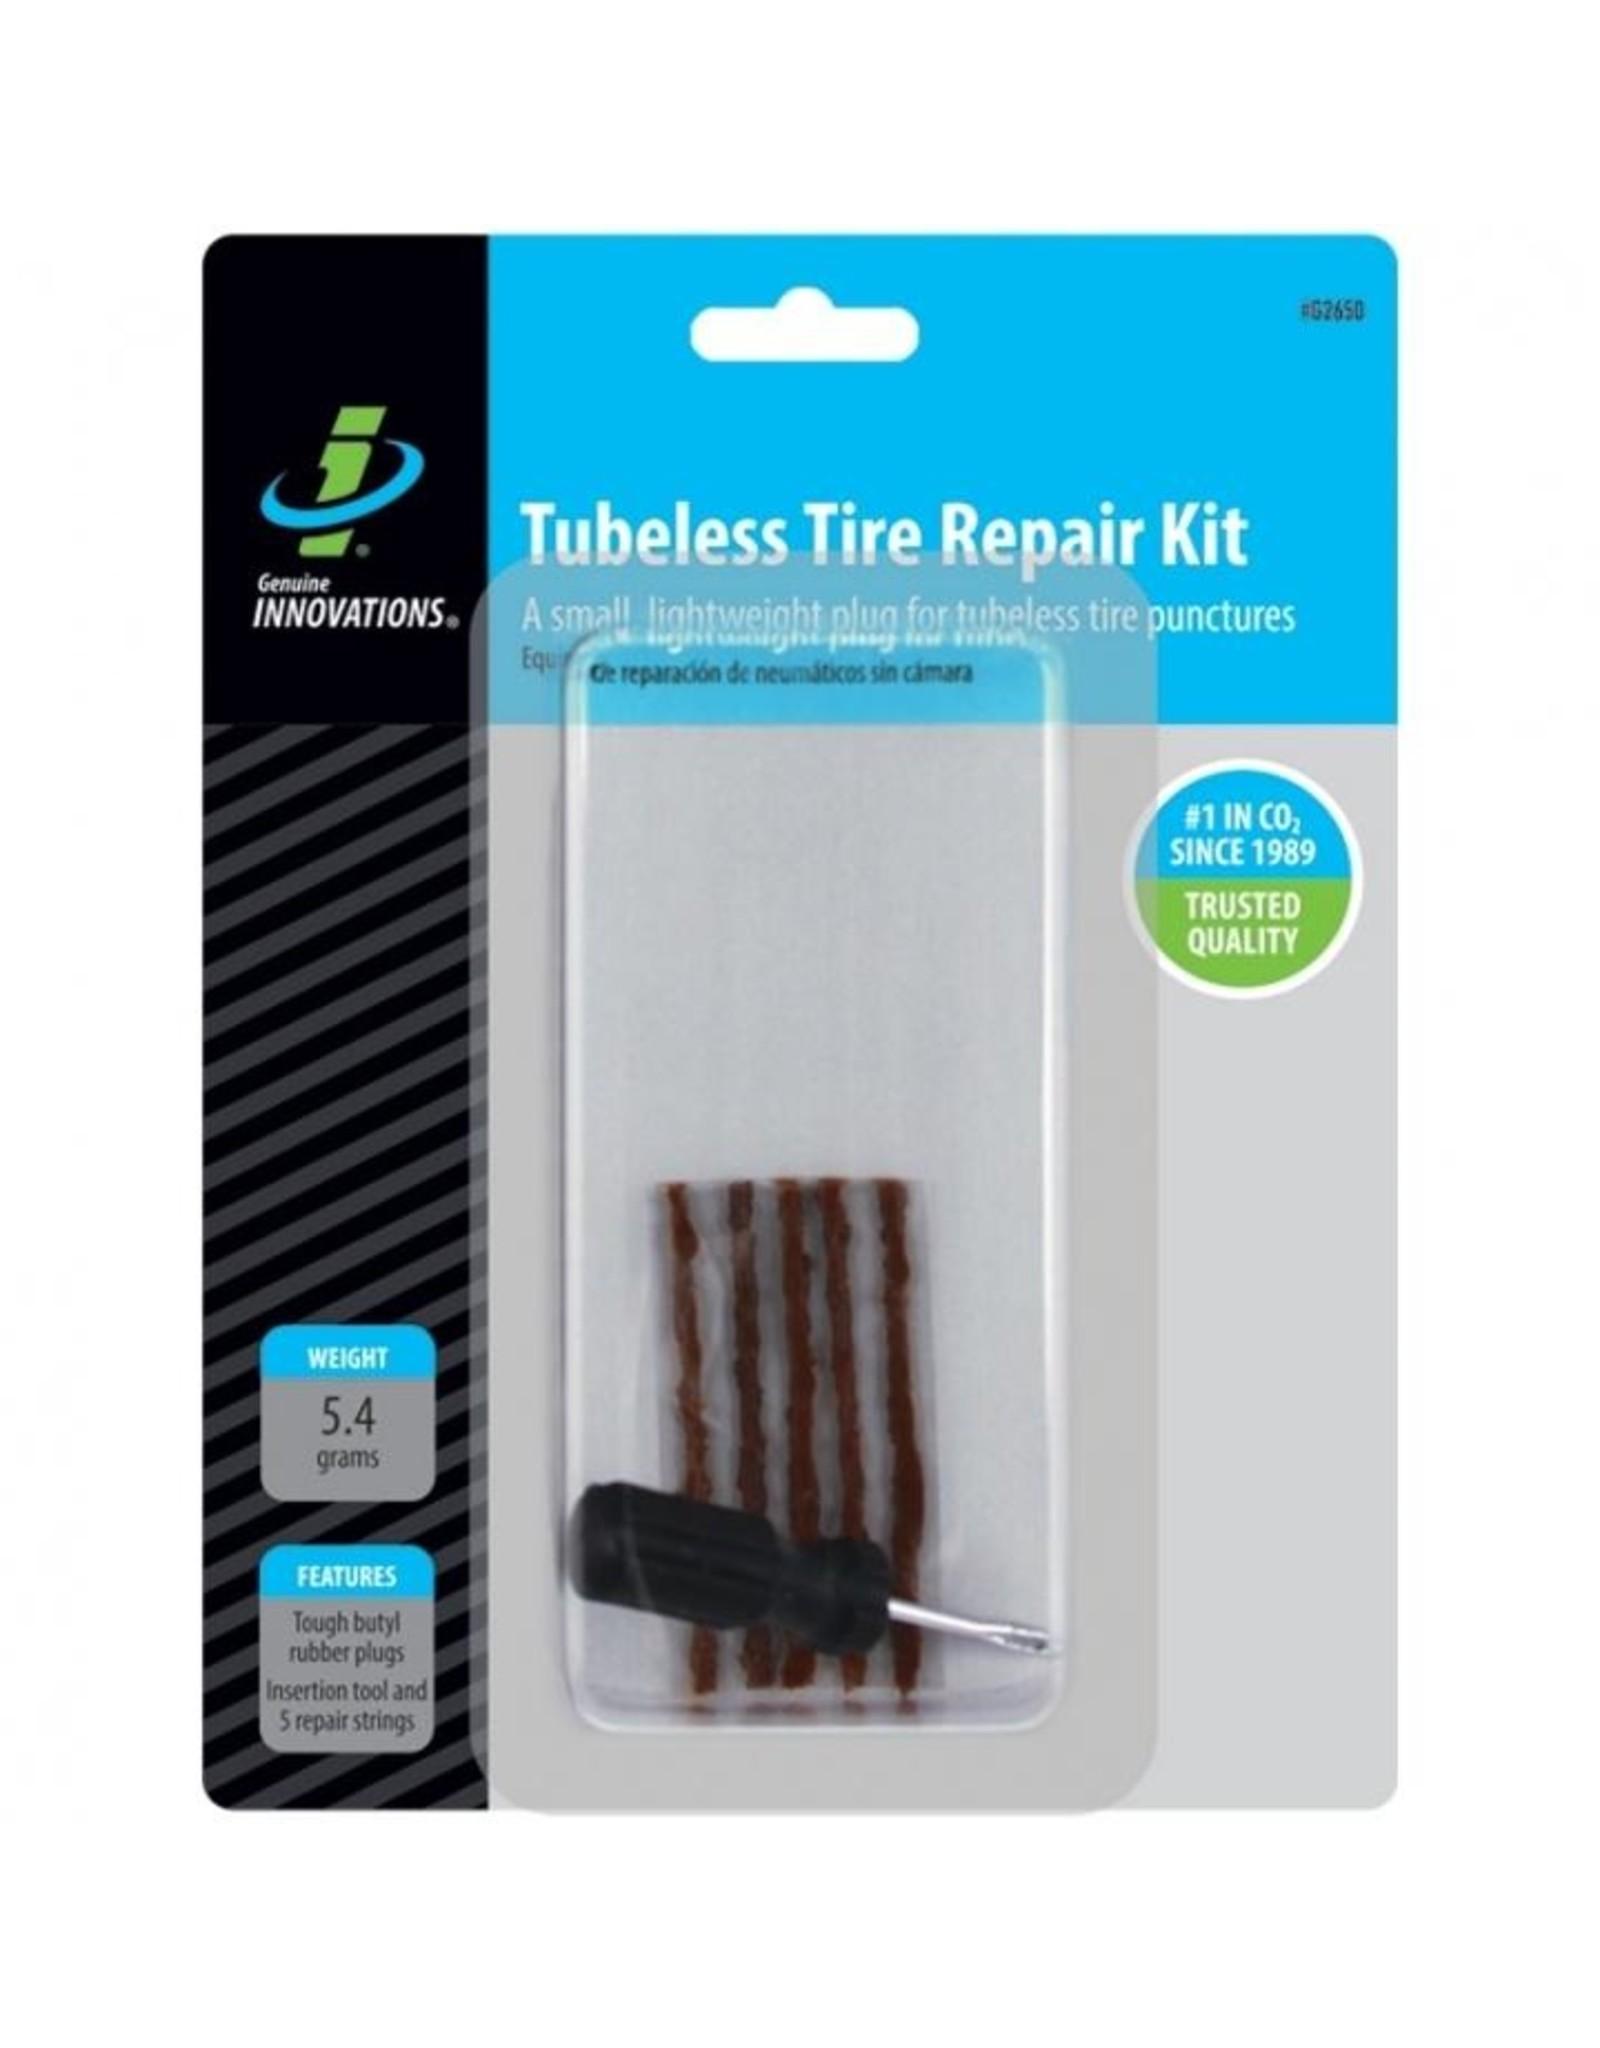 Genuine Innovations Tubeless Tire Repair Kit